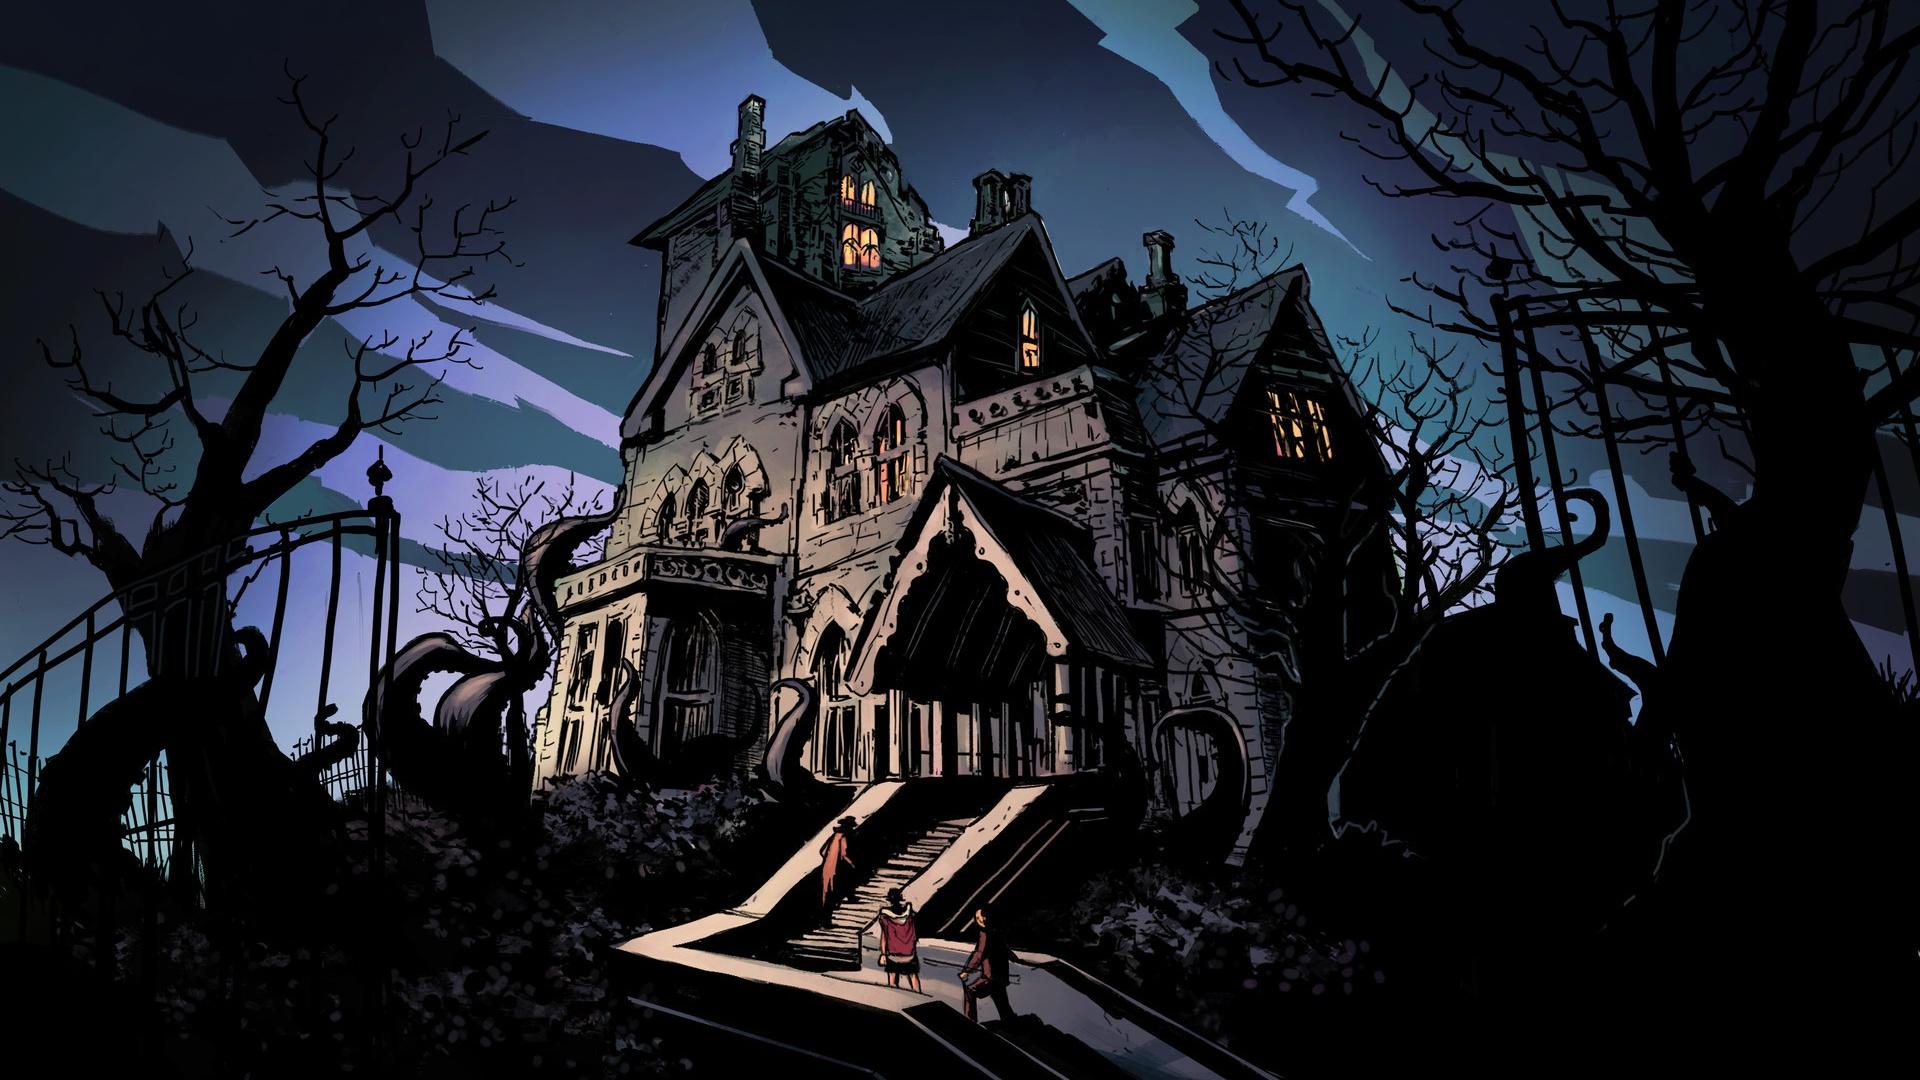 Papeis De Parede Noite Sombria Horror Casa Arvores Escada